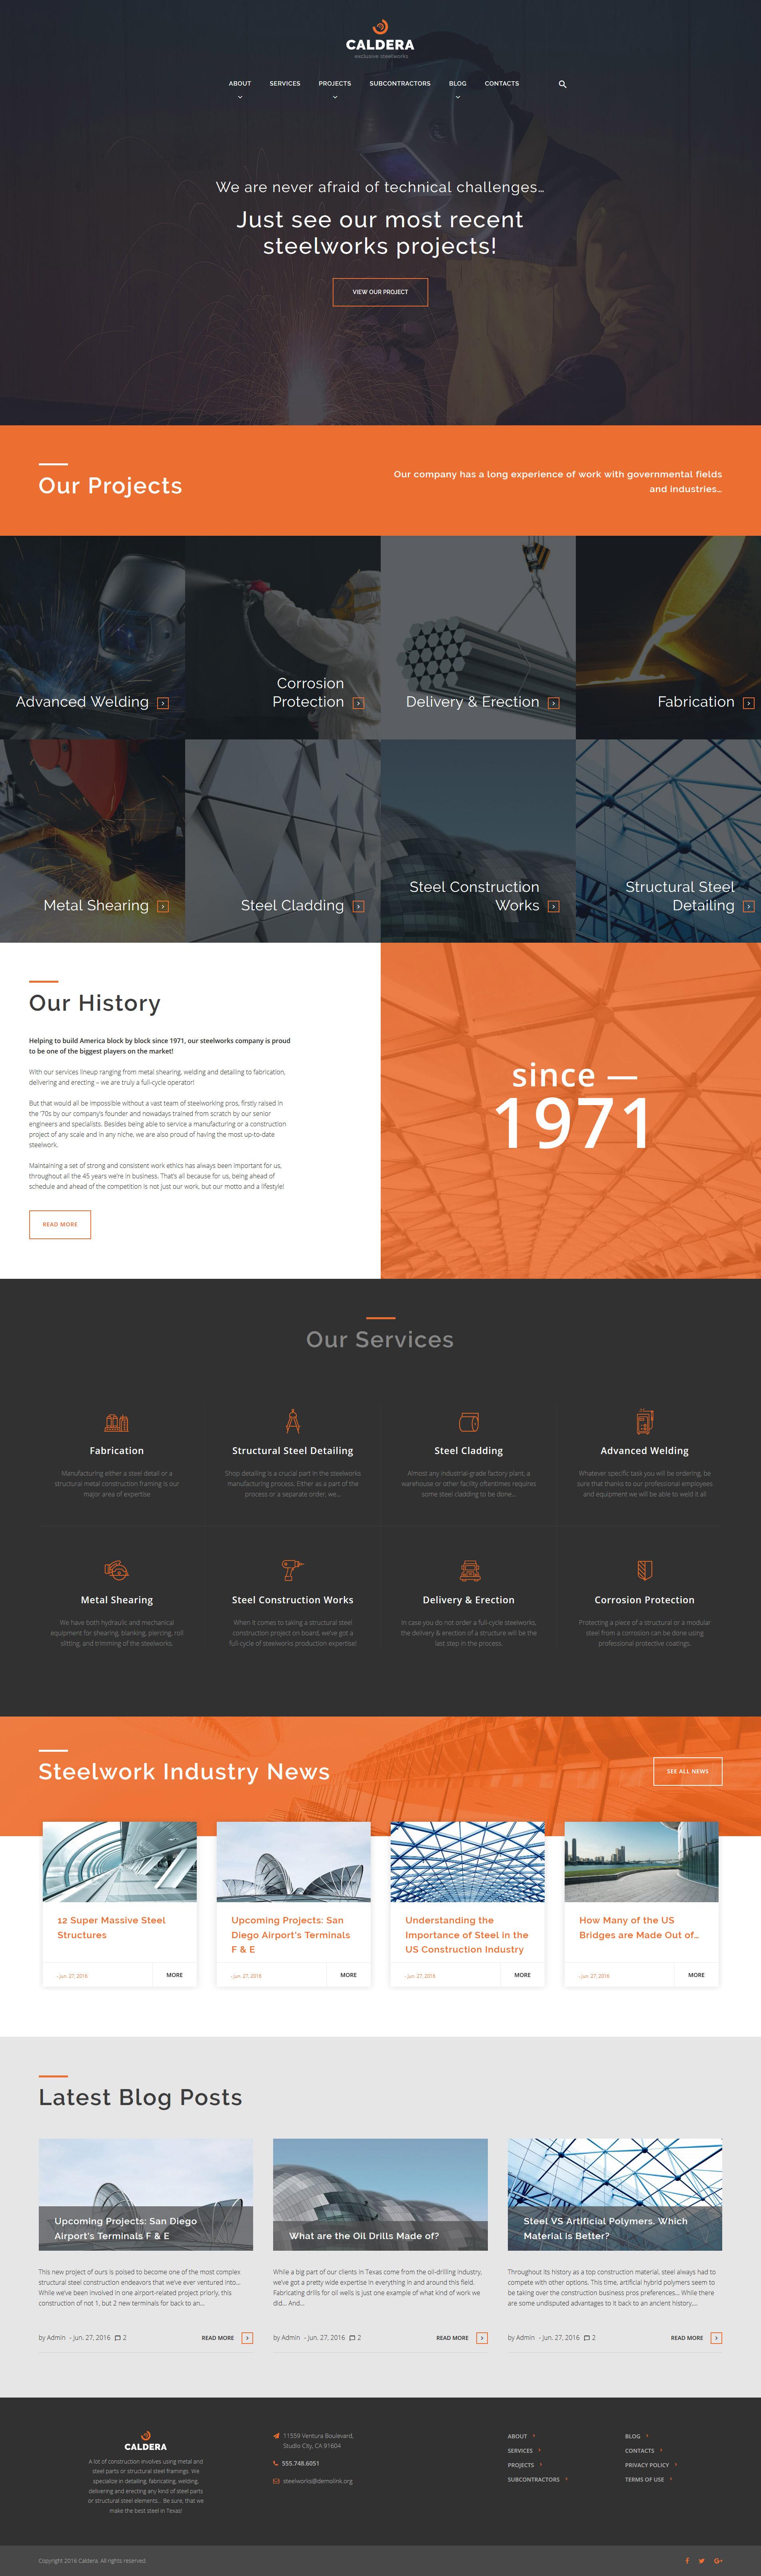 Responsivt Caldera - Steelworks and Constructions WordPress-tema #59027